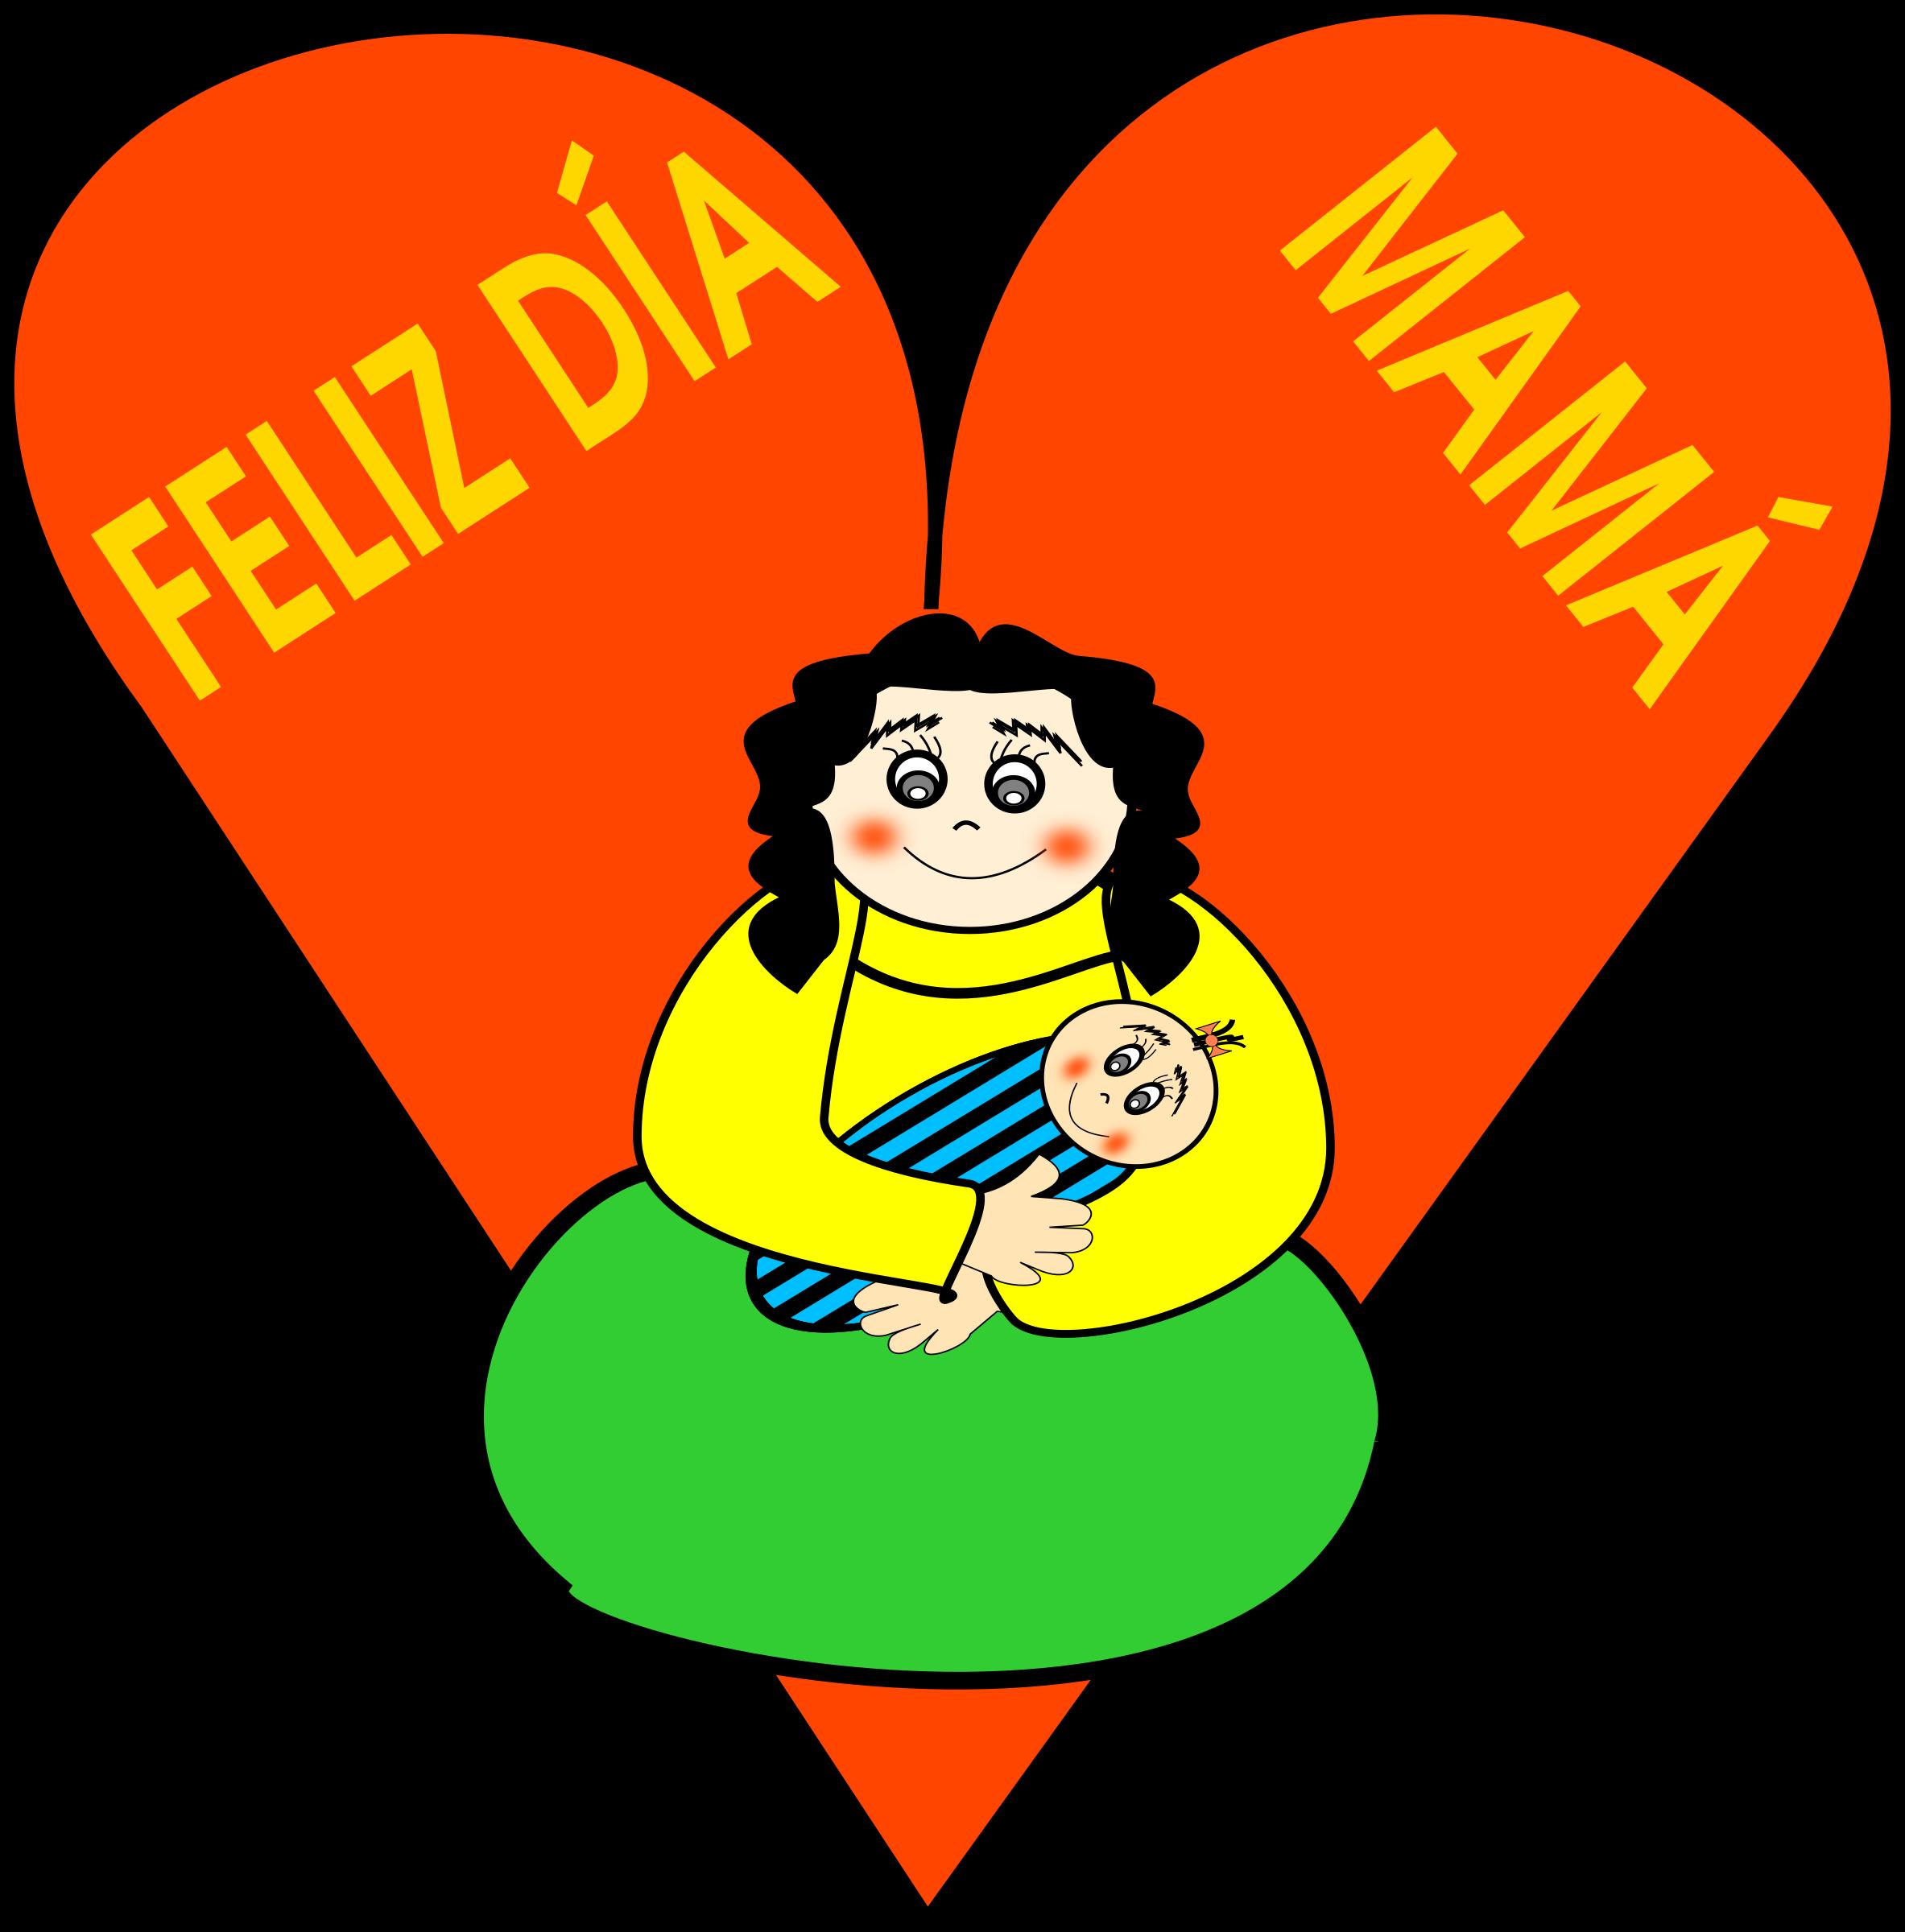 Day mother big image. Happy clipart orange